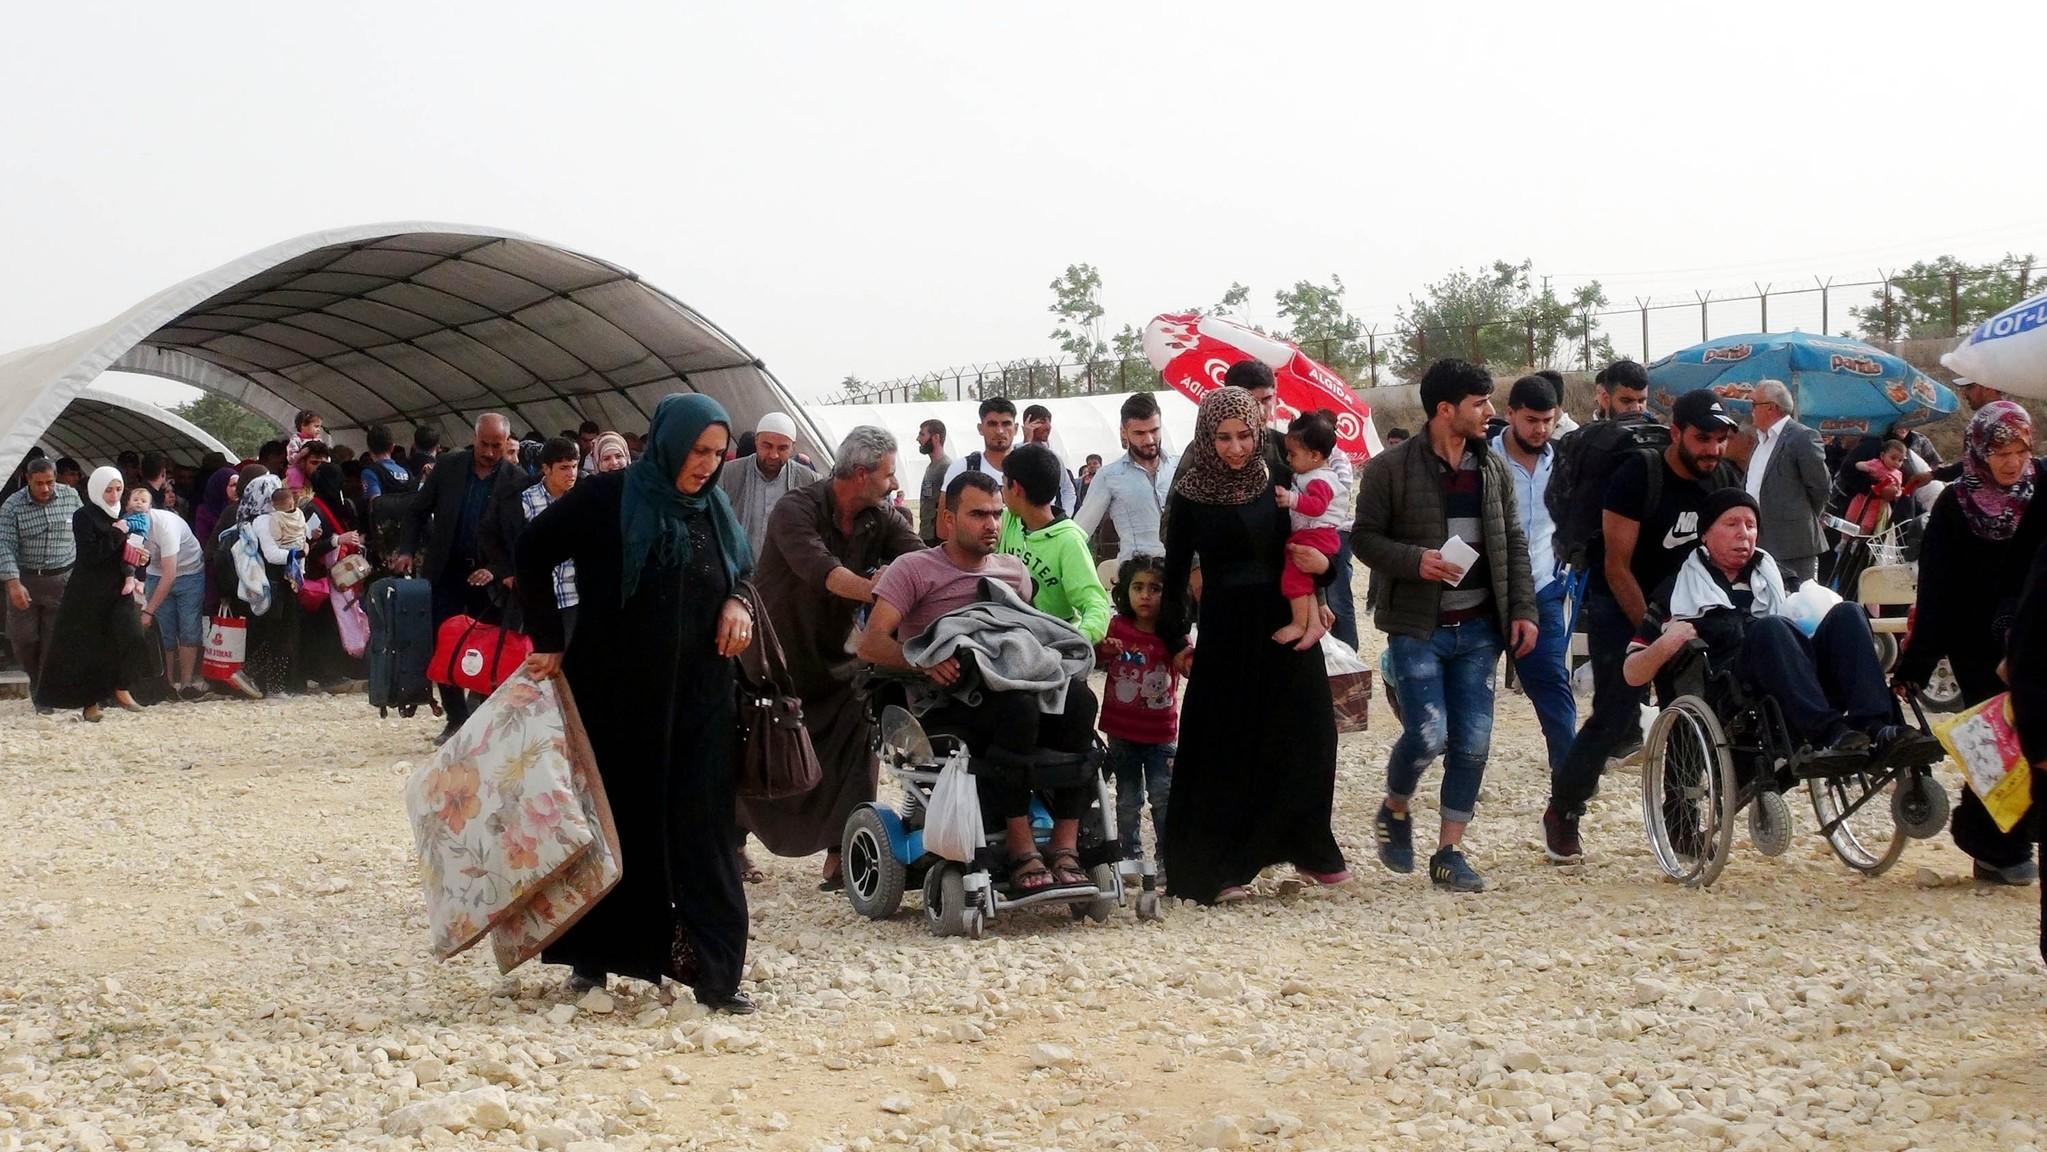 Syrians cross the border at Kilisu2019 u00d6ncu00fcpu0131nar en masse on Monday.